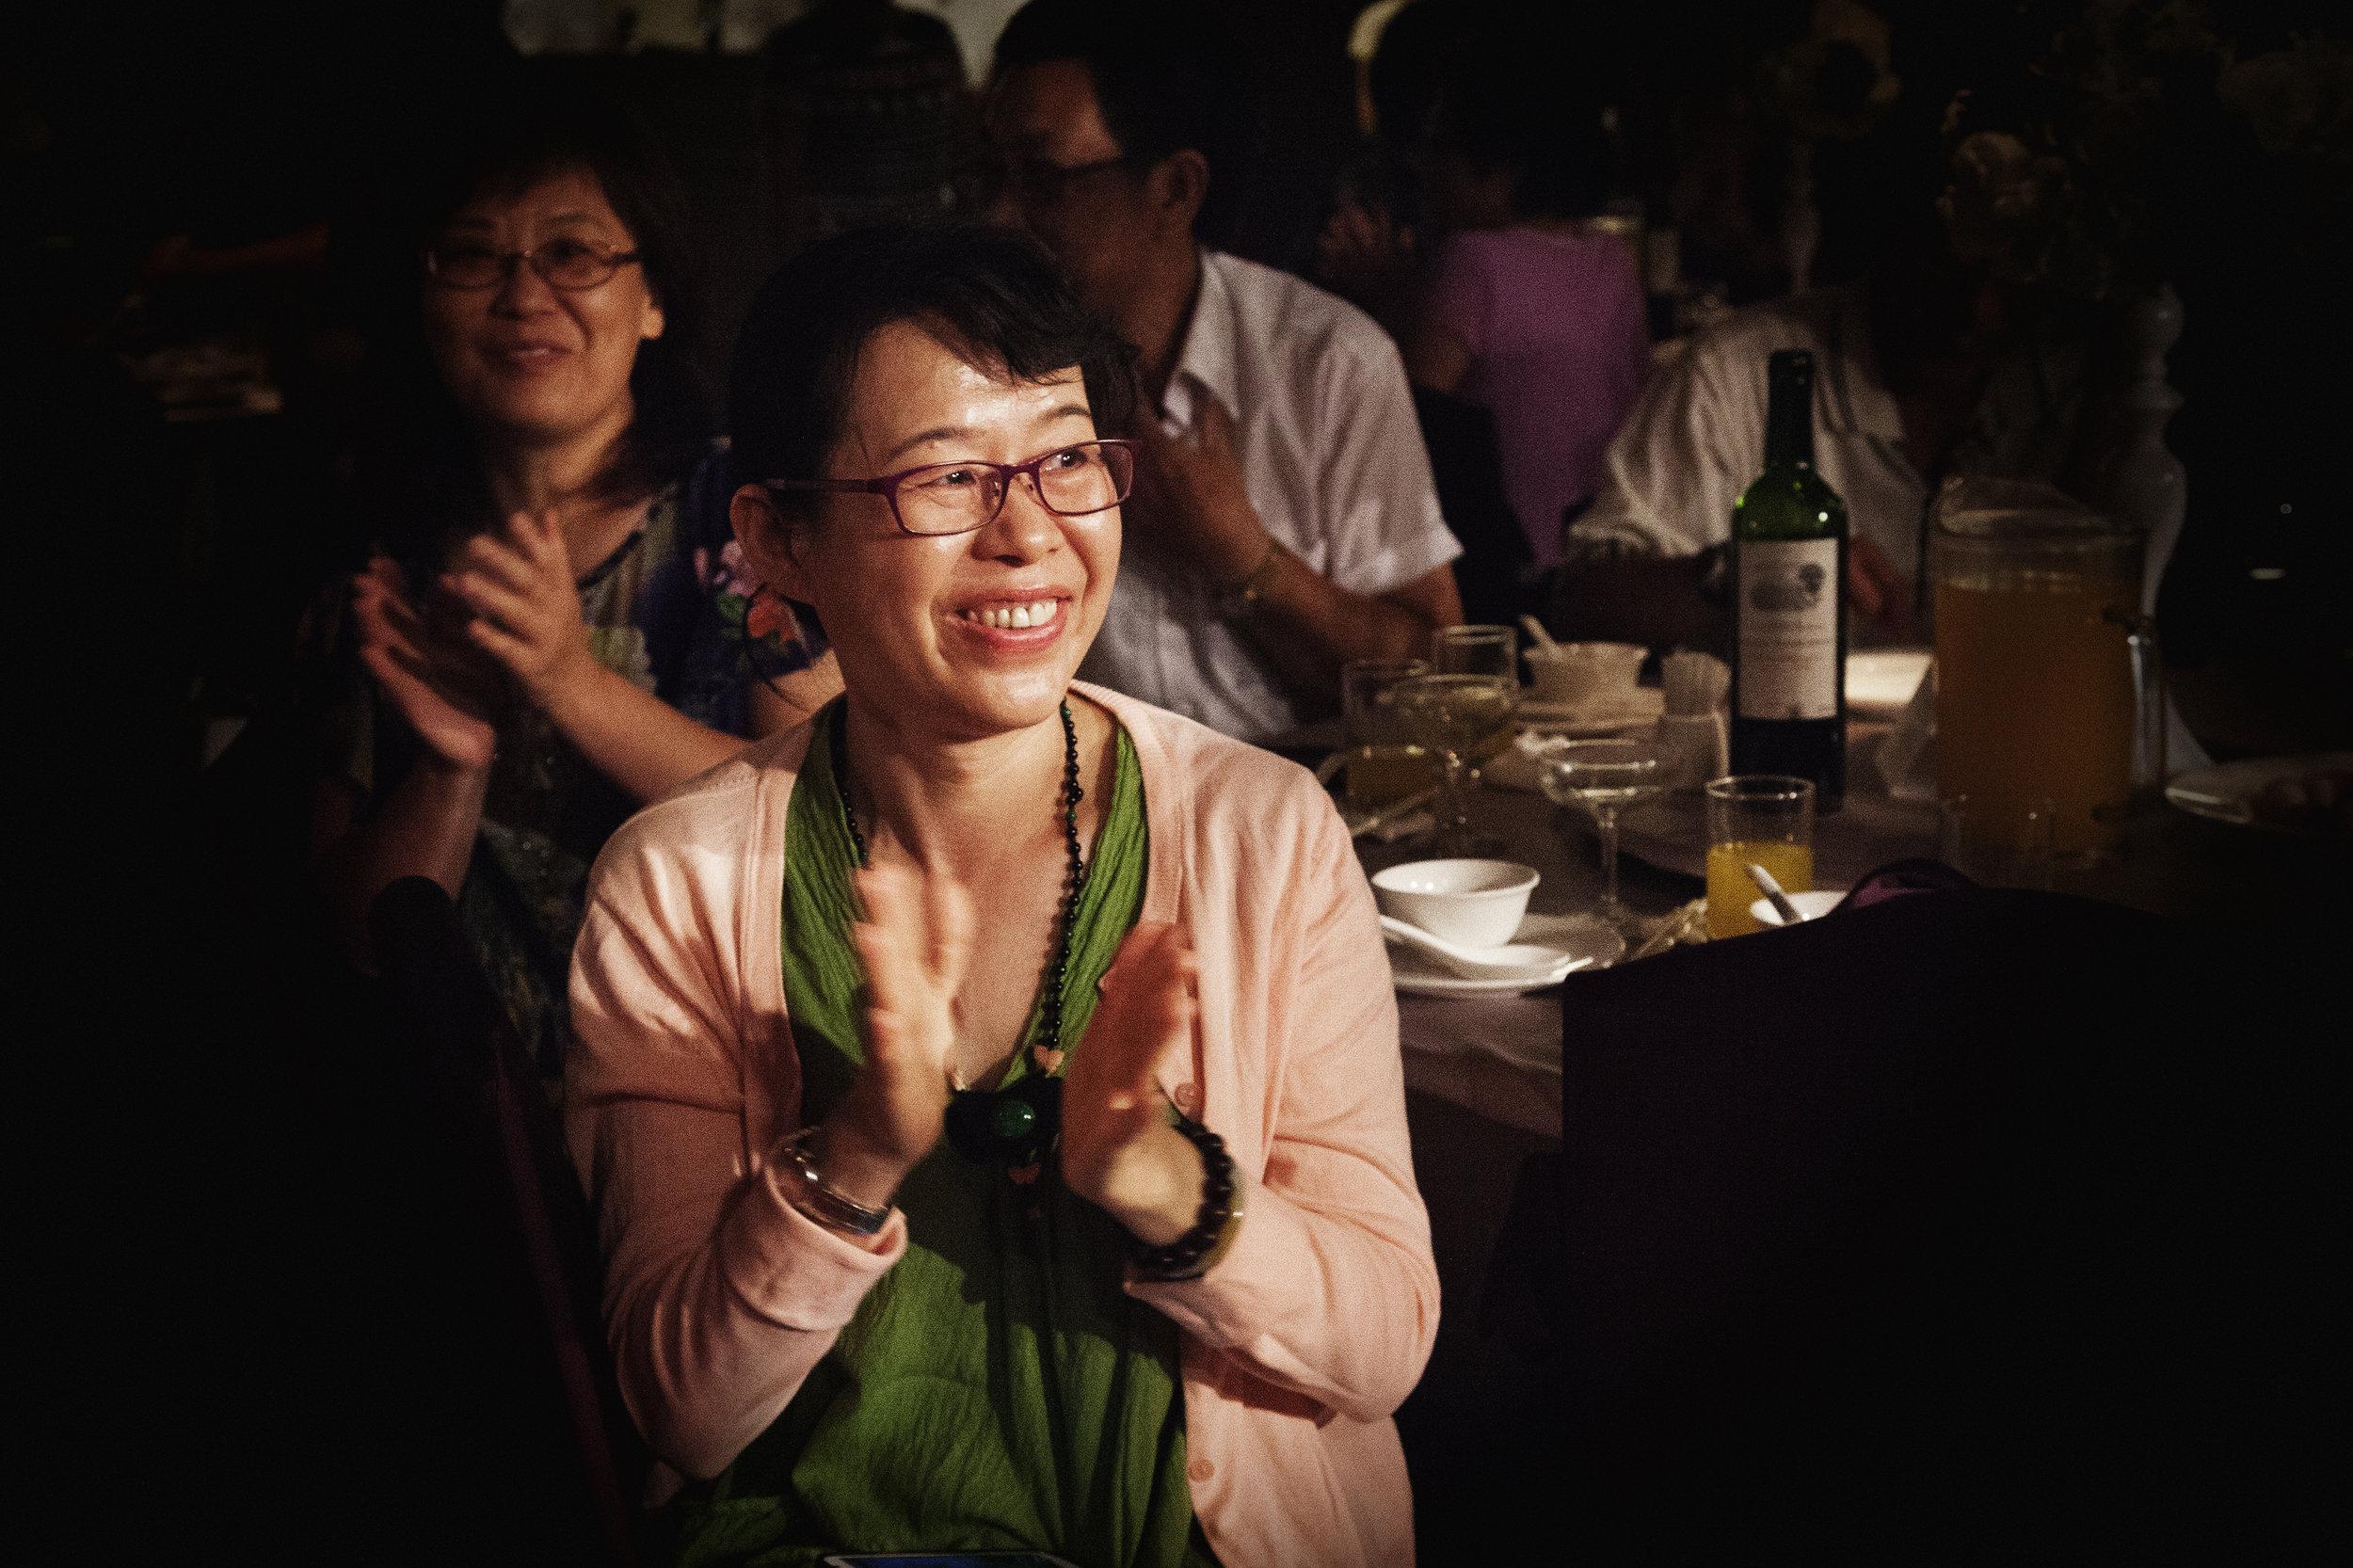 [JC]CREATIVE 女性攝影師 北投儷宴會館 補請台灣WEDDING    自然風格 台北婚攝推 女婚攝  桃園婚攝   圖像00149.JPG